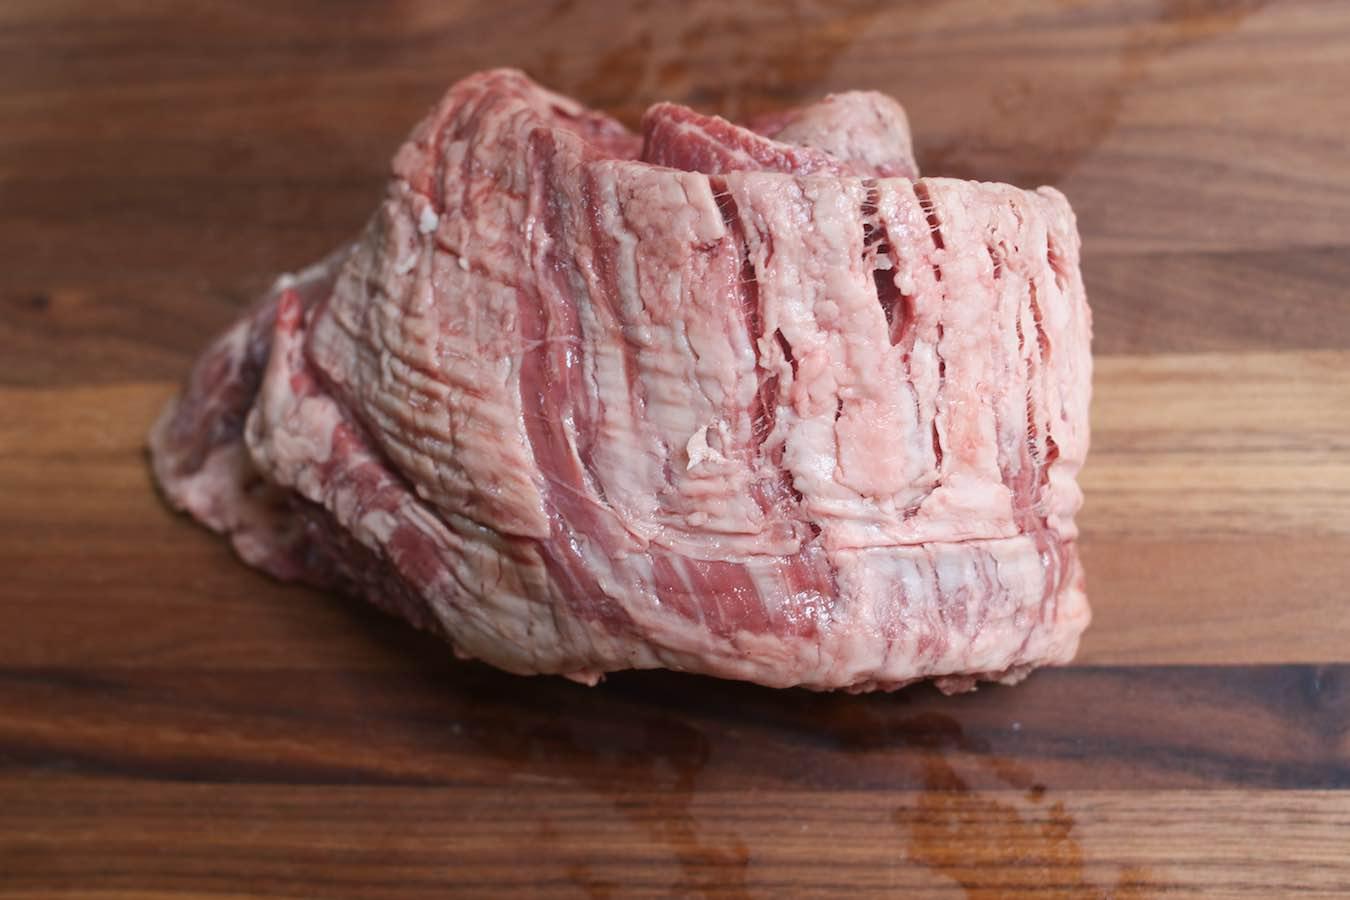 raw skirt steak